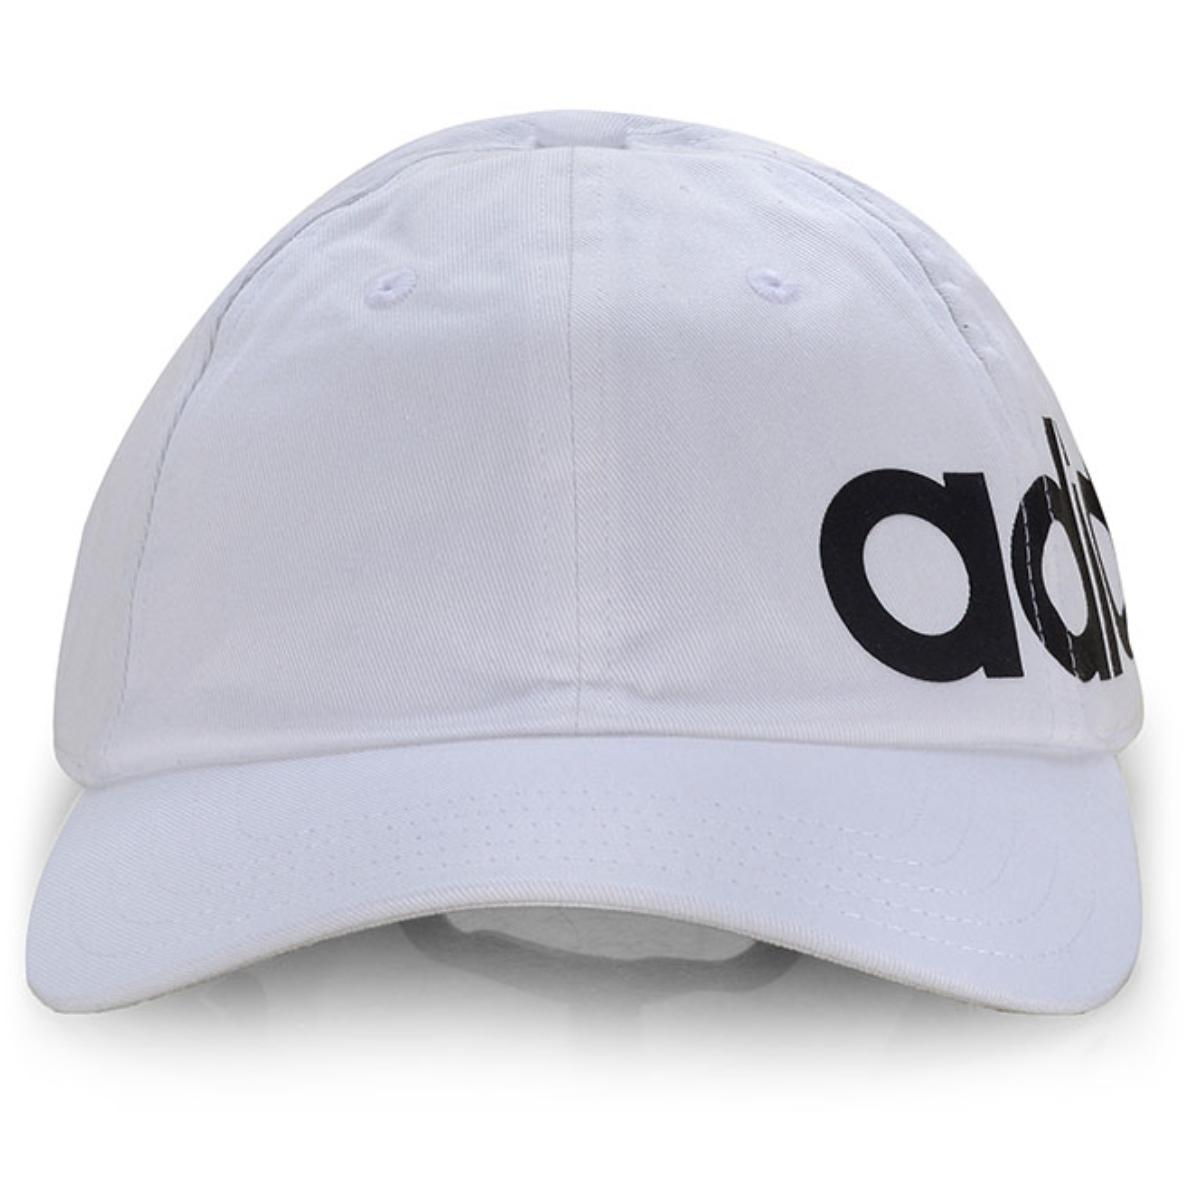 Boné Masc Infantil Adidas Ed0319 Bsbll Lnr Bld Branco